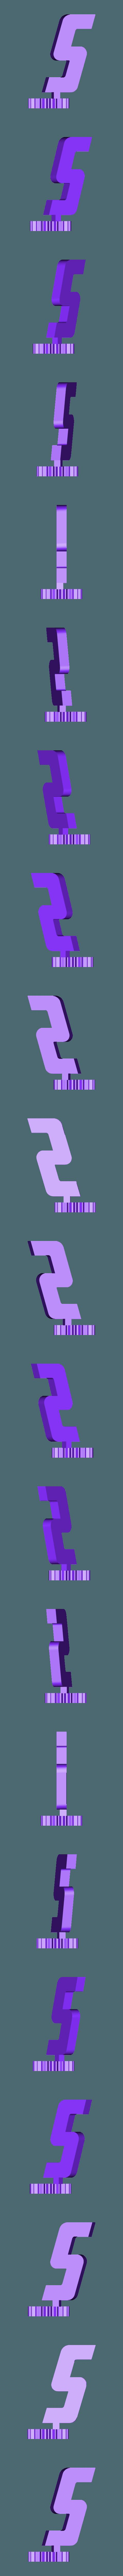 S, Avengers Logo.STL Download free STL file Avengers Rotating Logo • 3D printing template, potentprintables